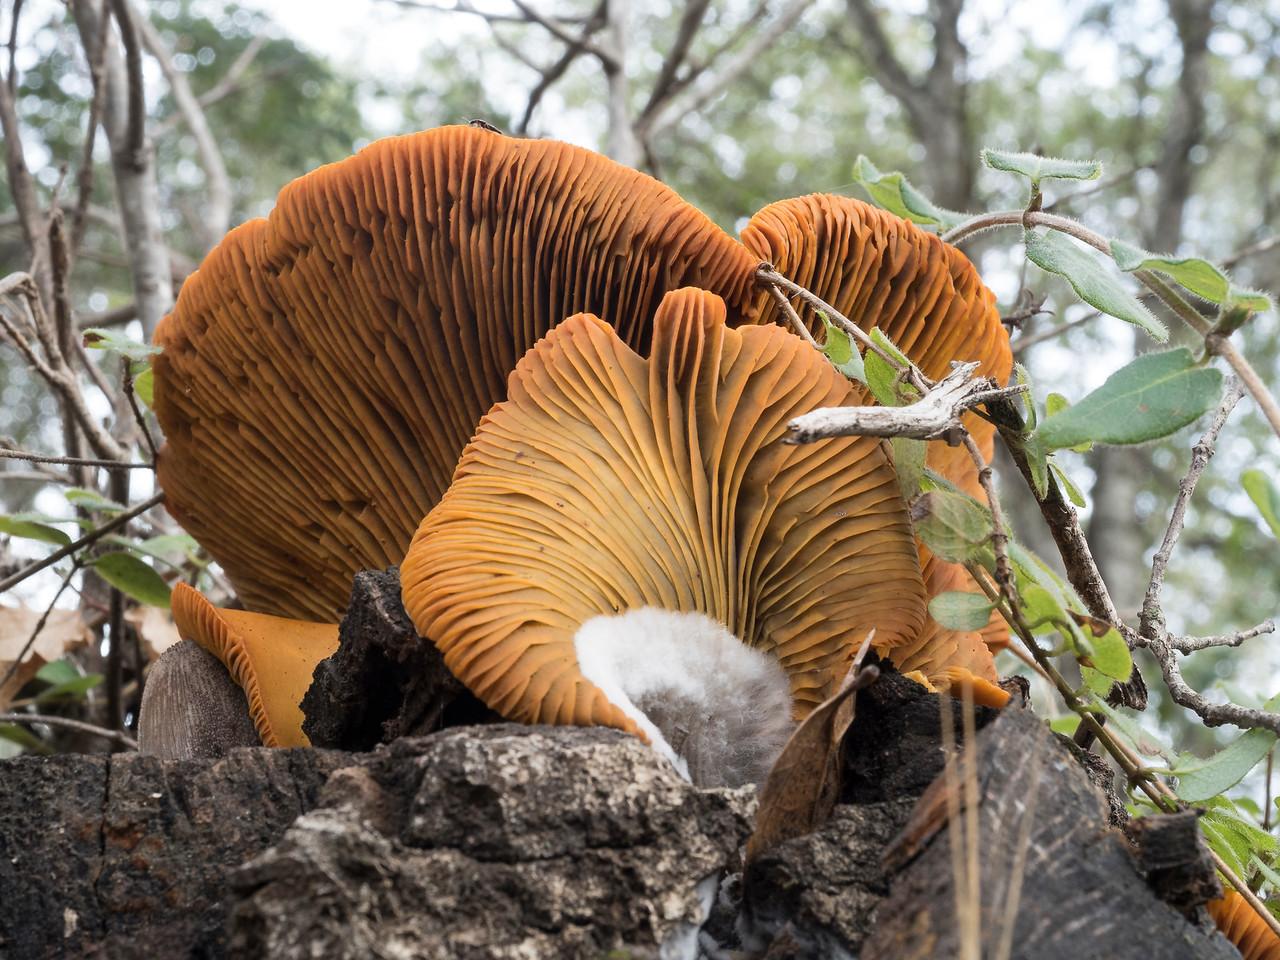 Omphalotus olivascens, western jack-o-lantern mushroom